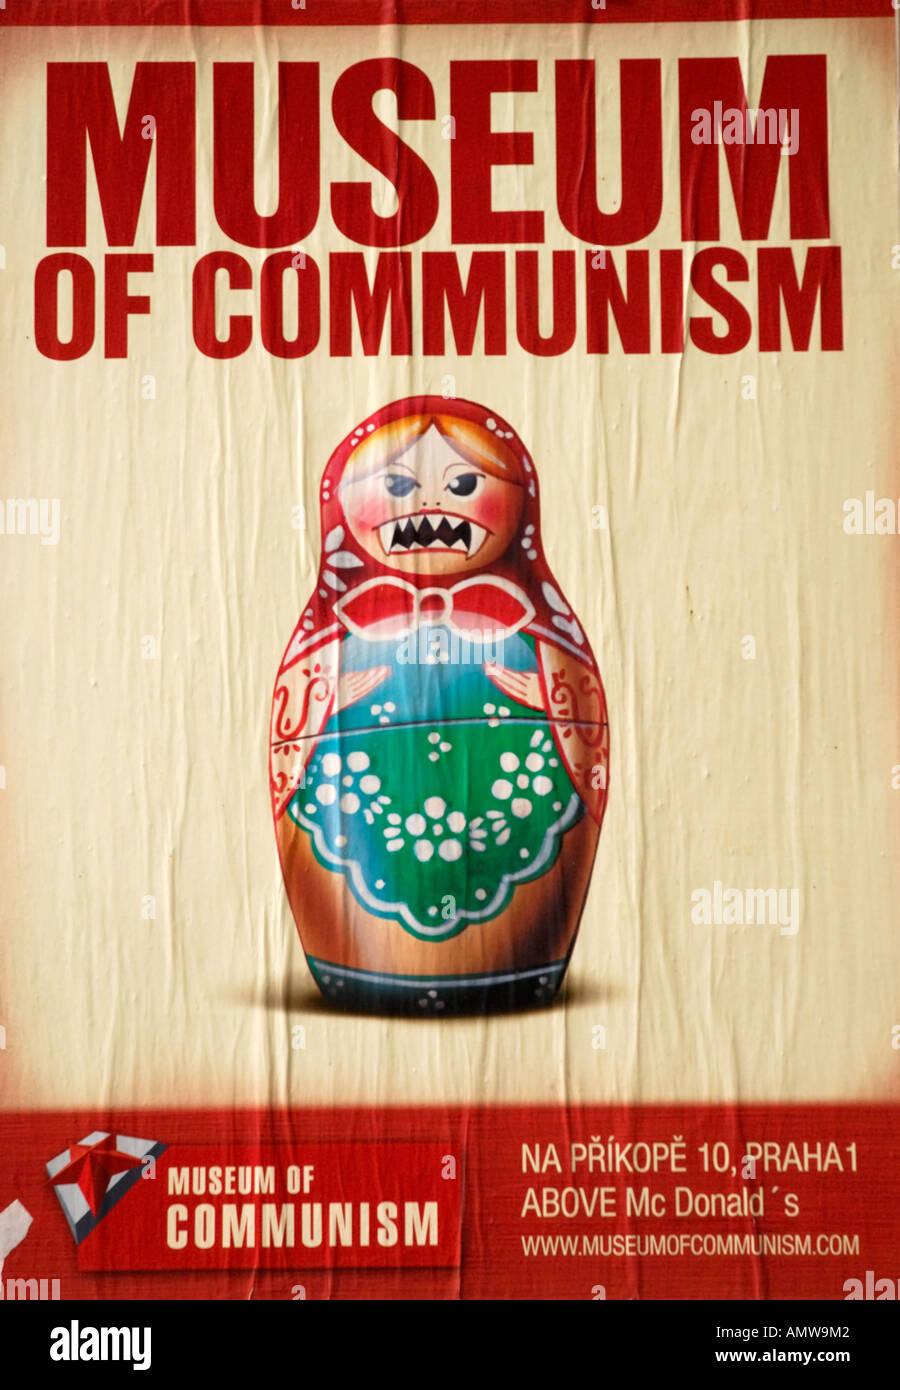 Museum of Communism poster Prague Czech Republic - Stock Image